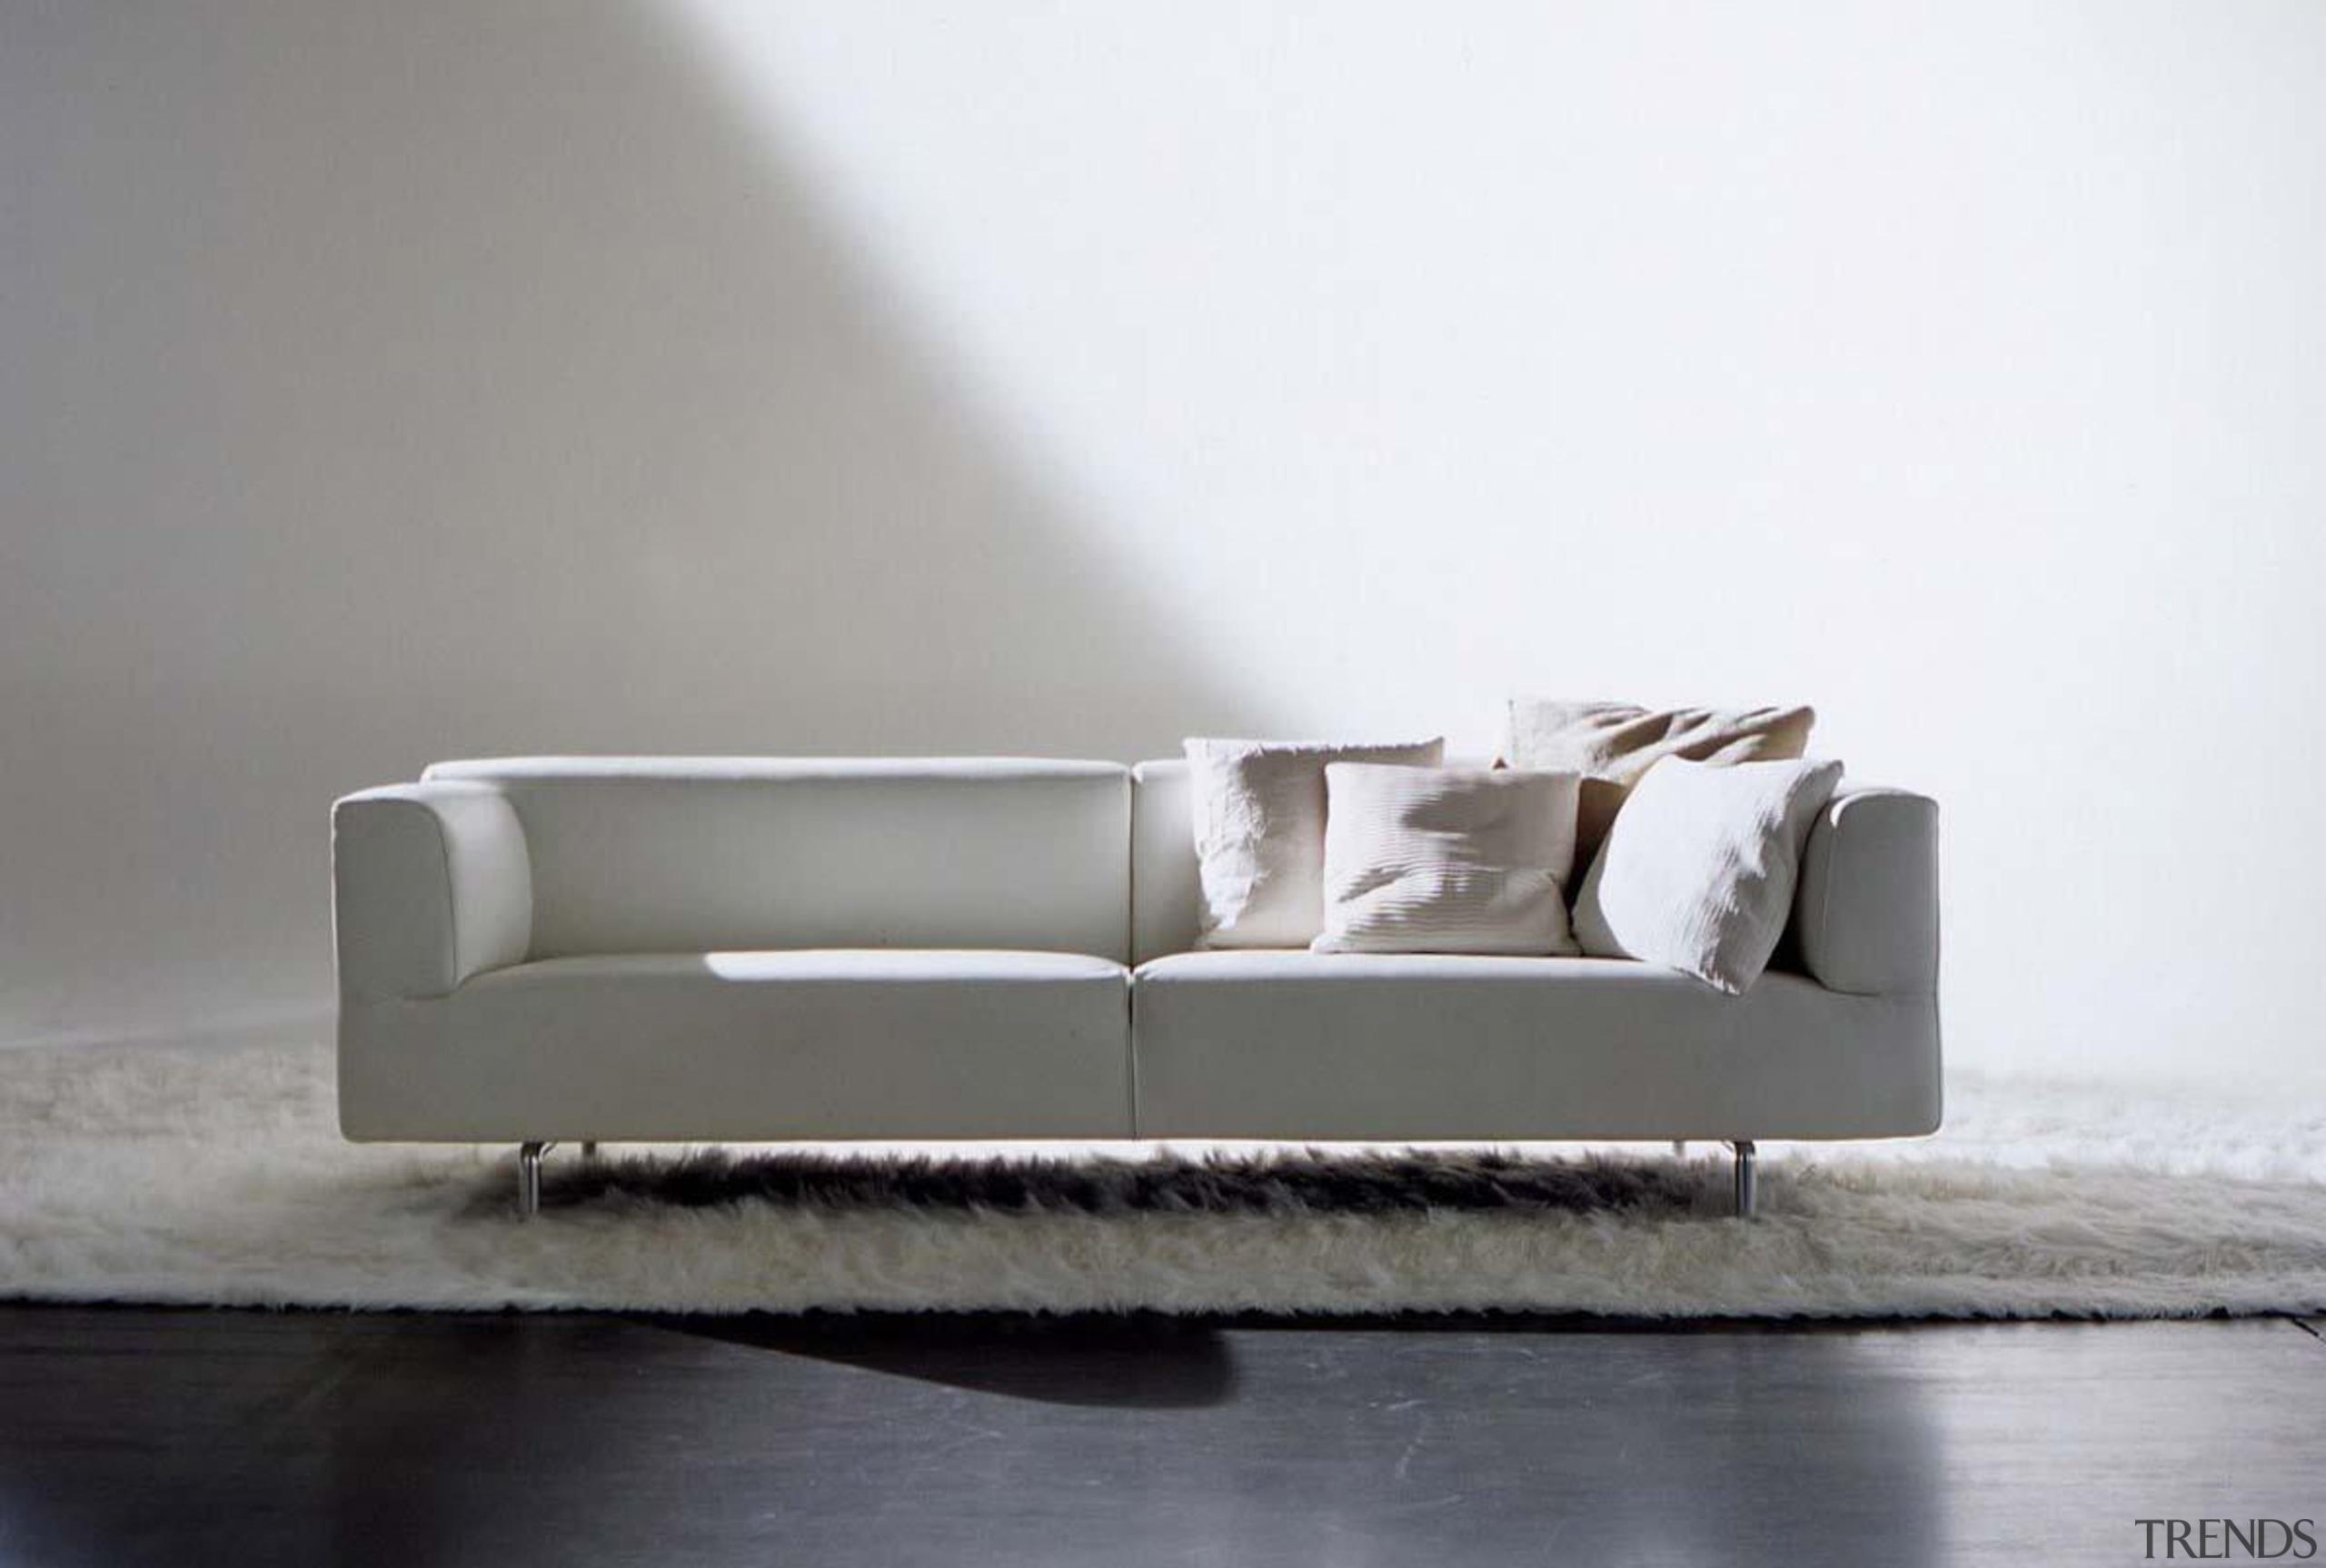 cassinalissonimetsofainstu8.jpg - cassinalissonimetsofainstu8.jpg - angle | chaise longue angle, chaise longue, couch, furniture, interior design, loveseat, product design, sofa bed, studio couch, table, gray, white